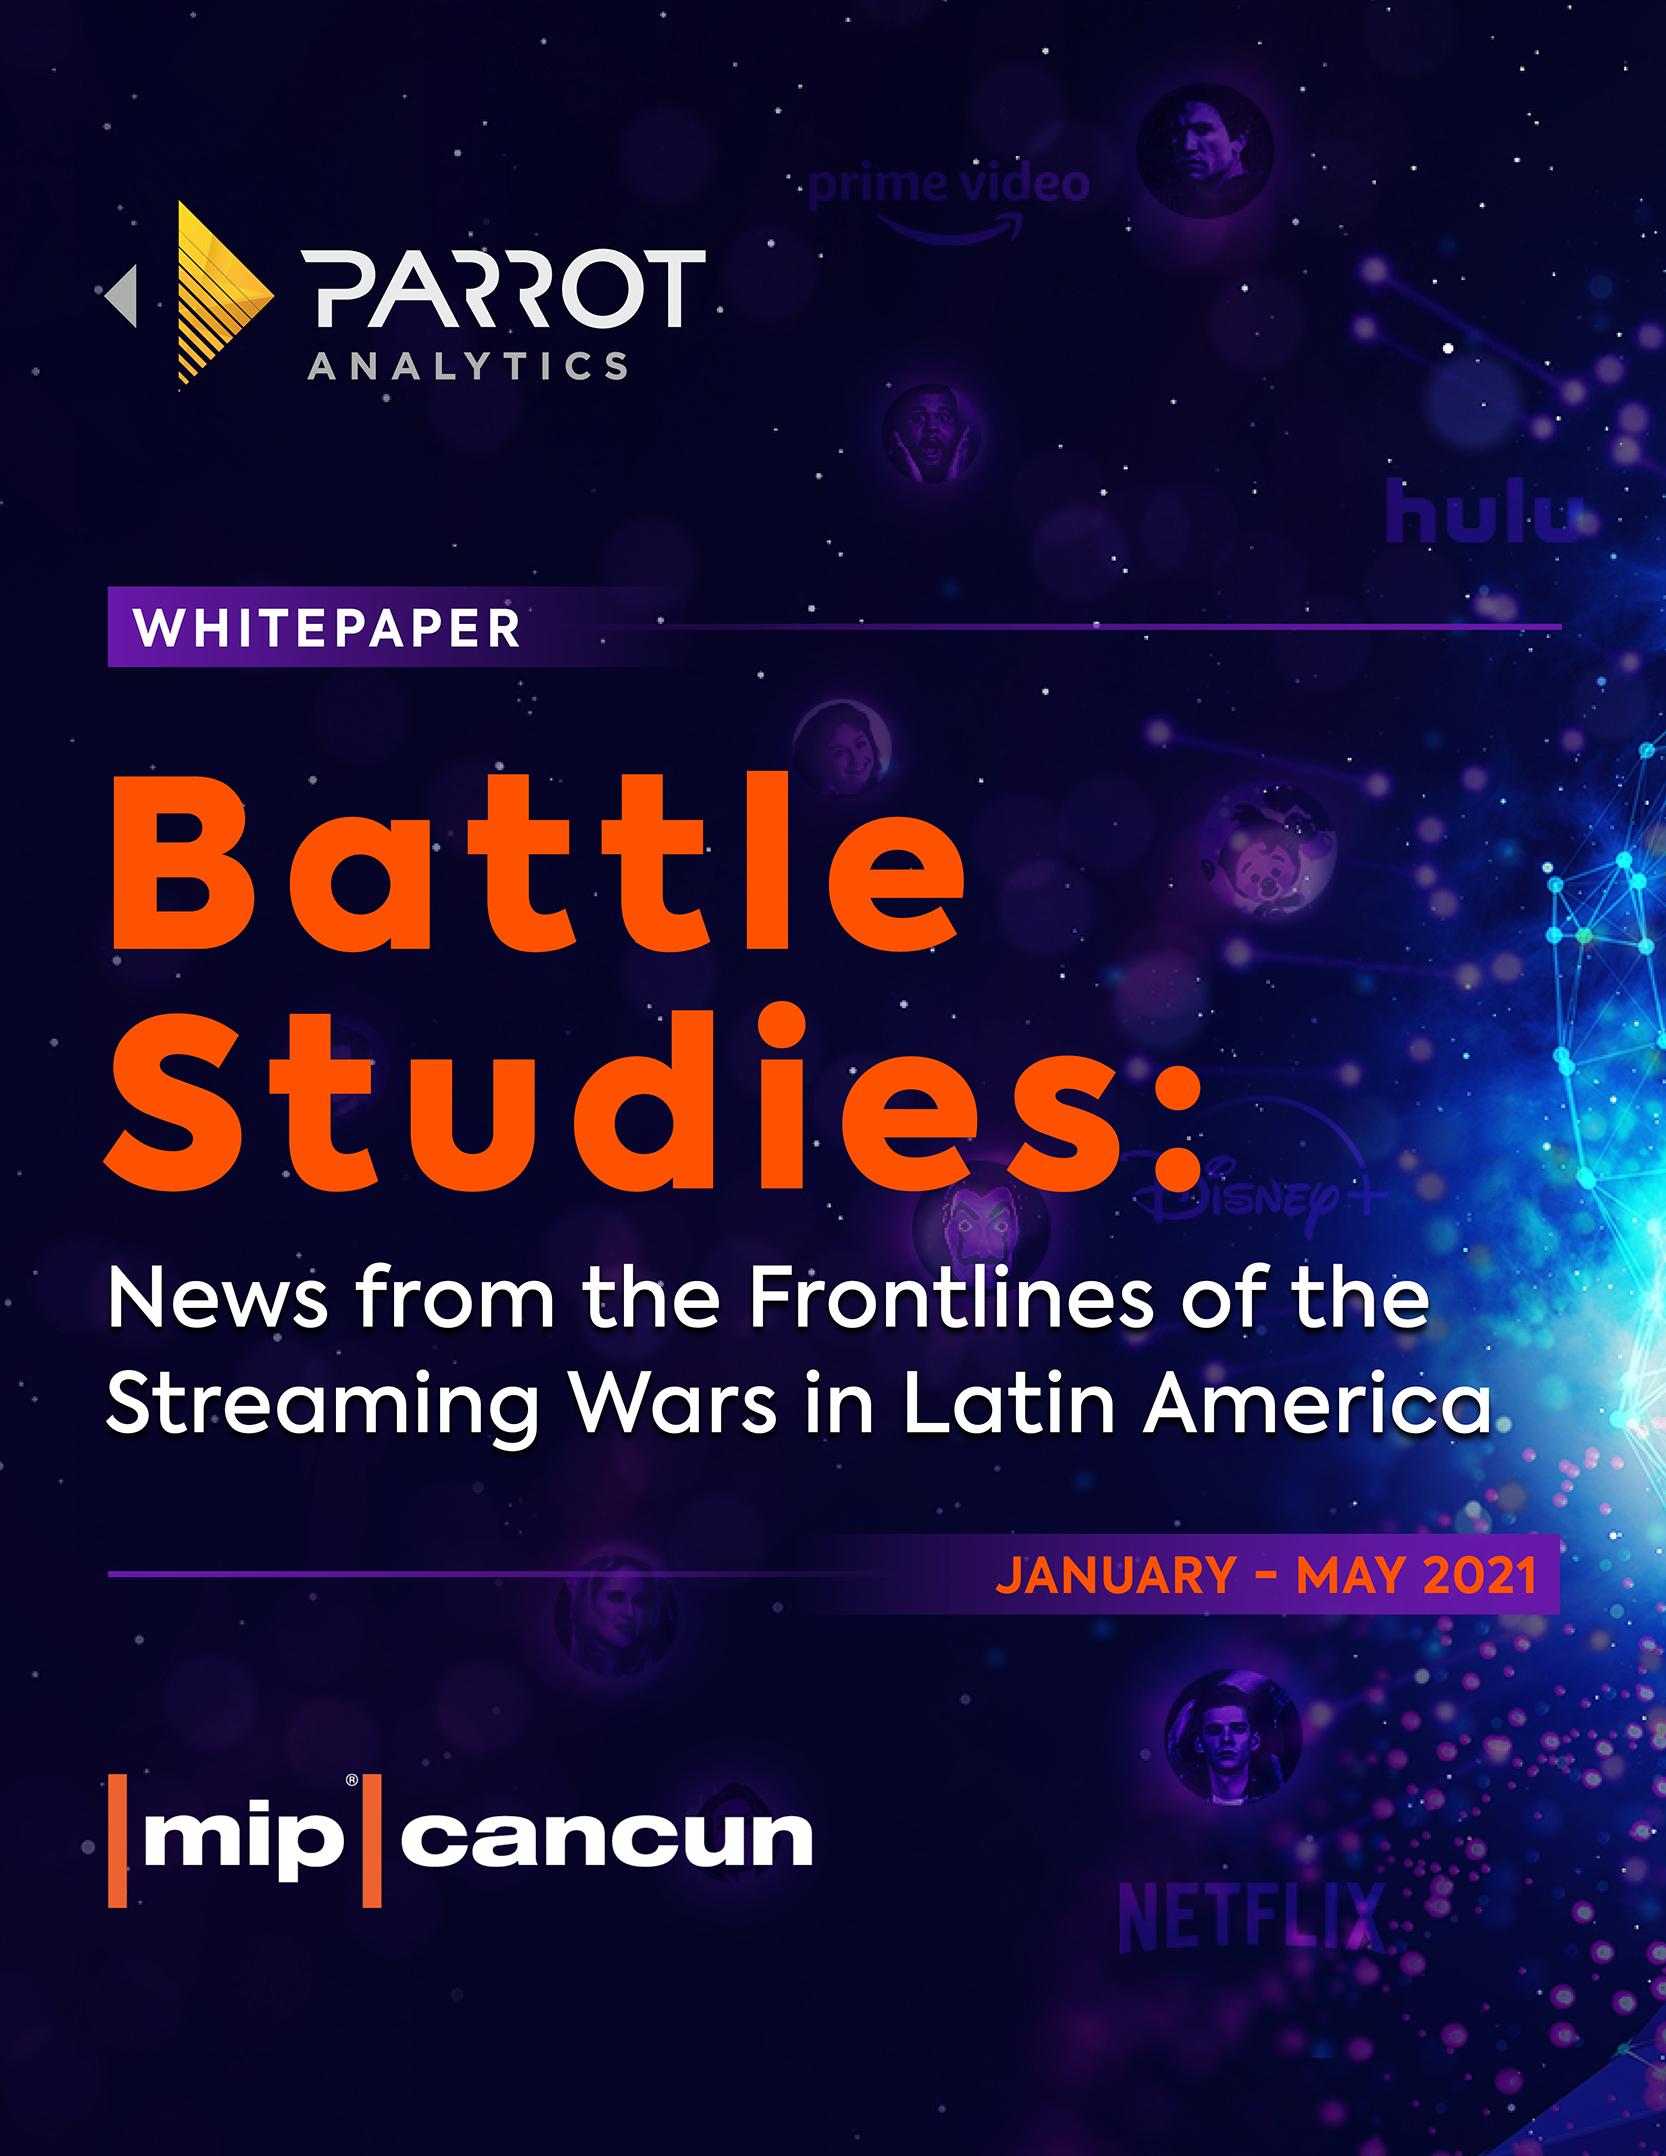 Parrot_MIP_Cancun_Whitepaper